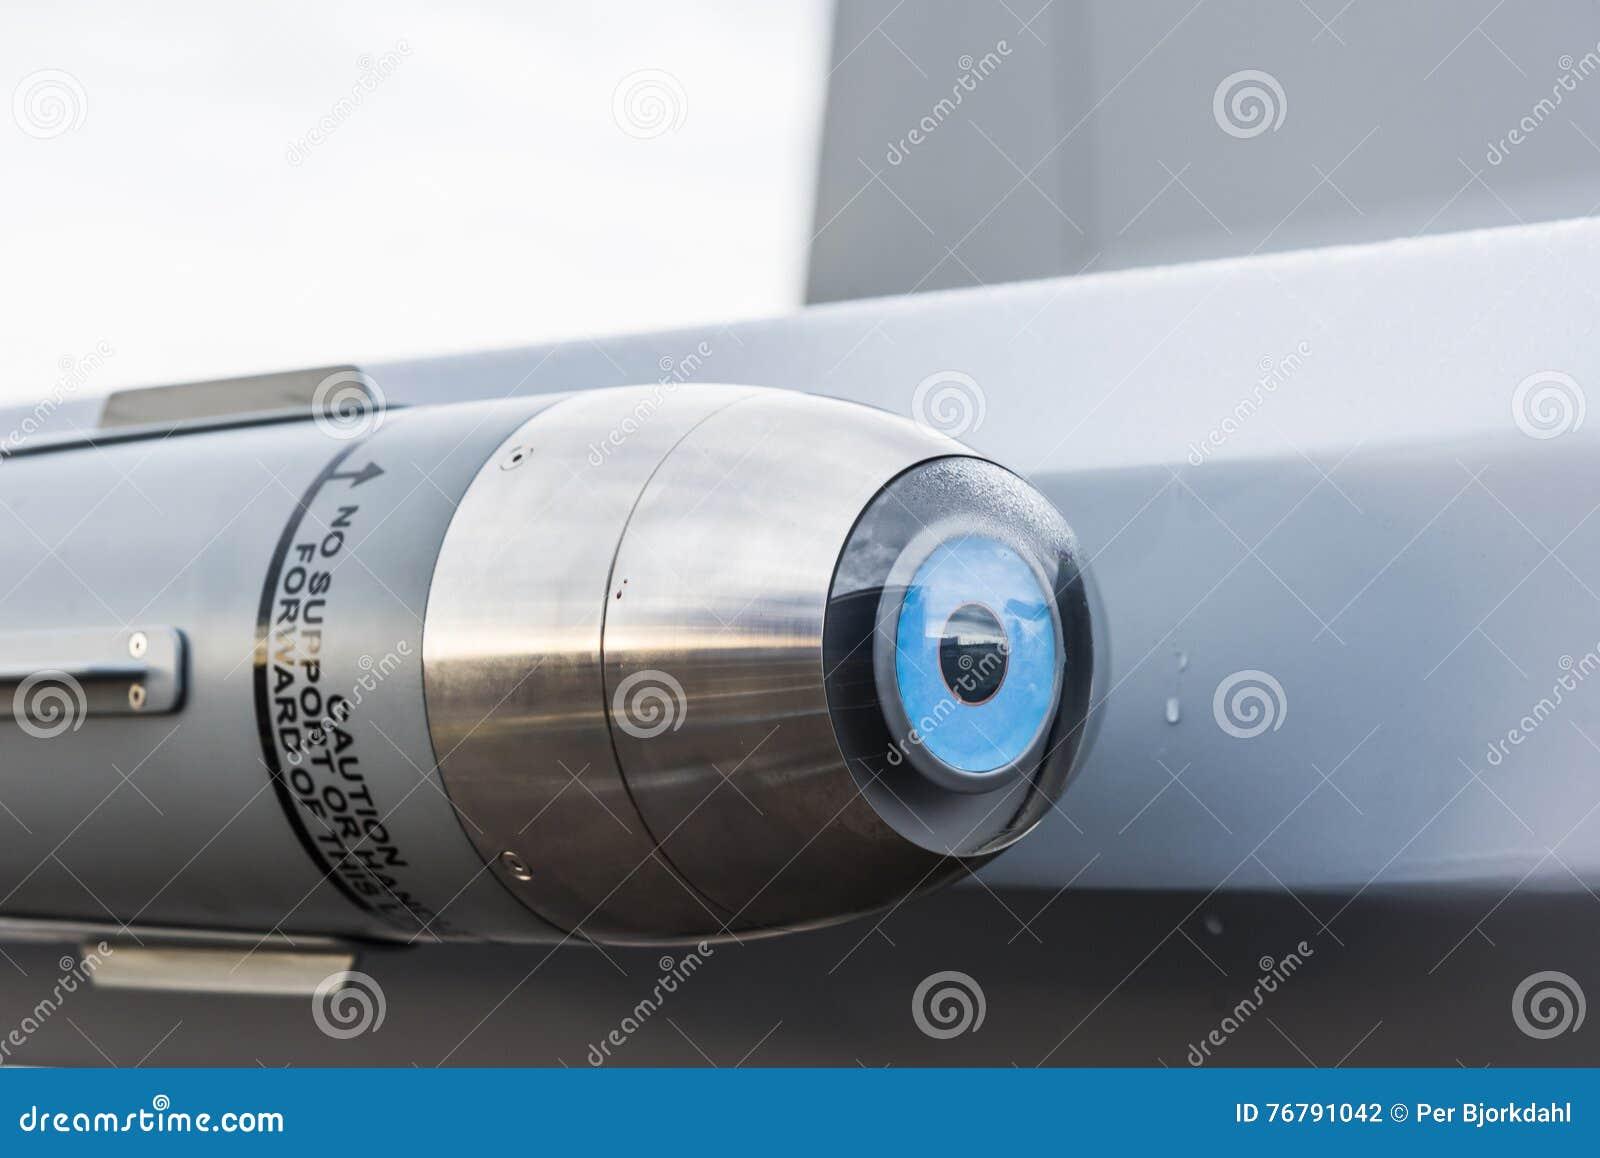 iris-t-air-to-air-missile-seeker-head-mounted-gripen-ng-aircraft-mockup-malmen-base-linkoping-sweden-76791042.jpg